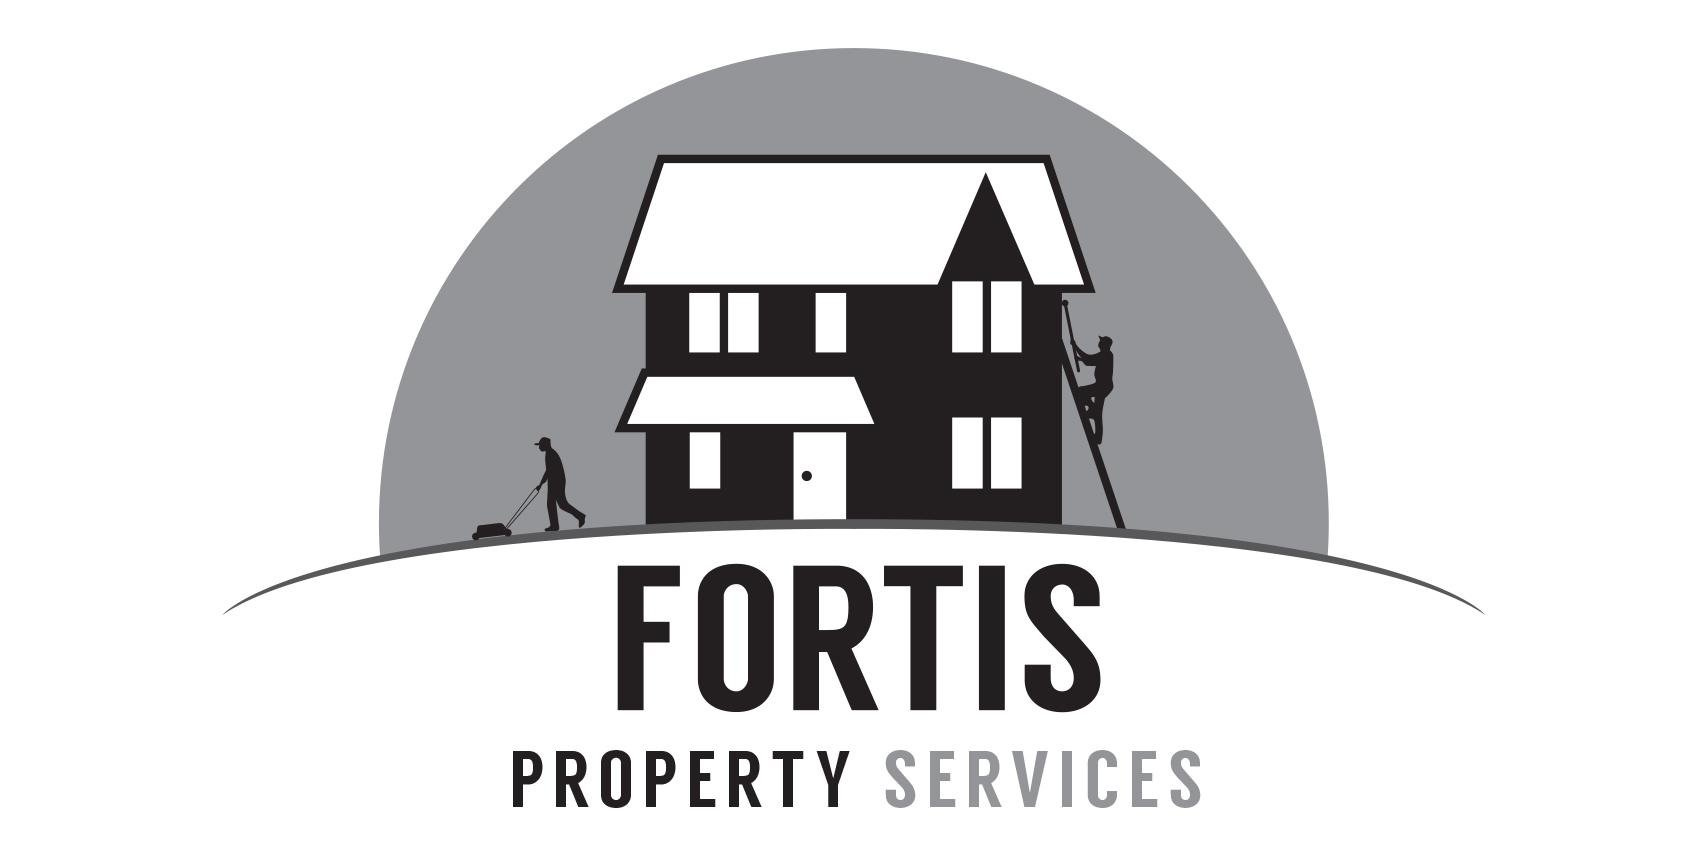 Fortis Property Services Logo alternative black & white